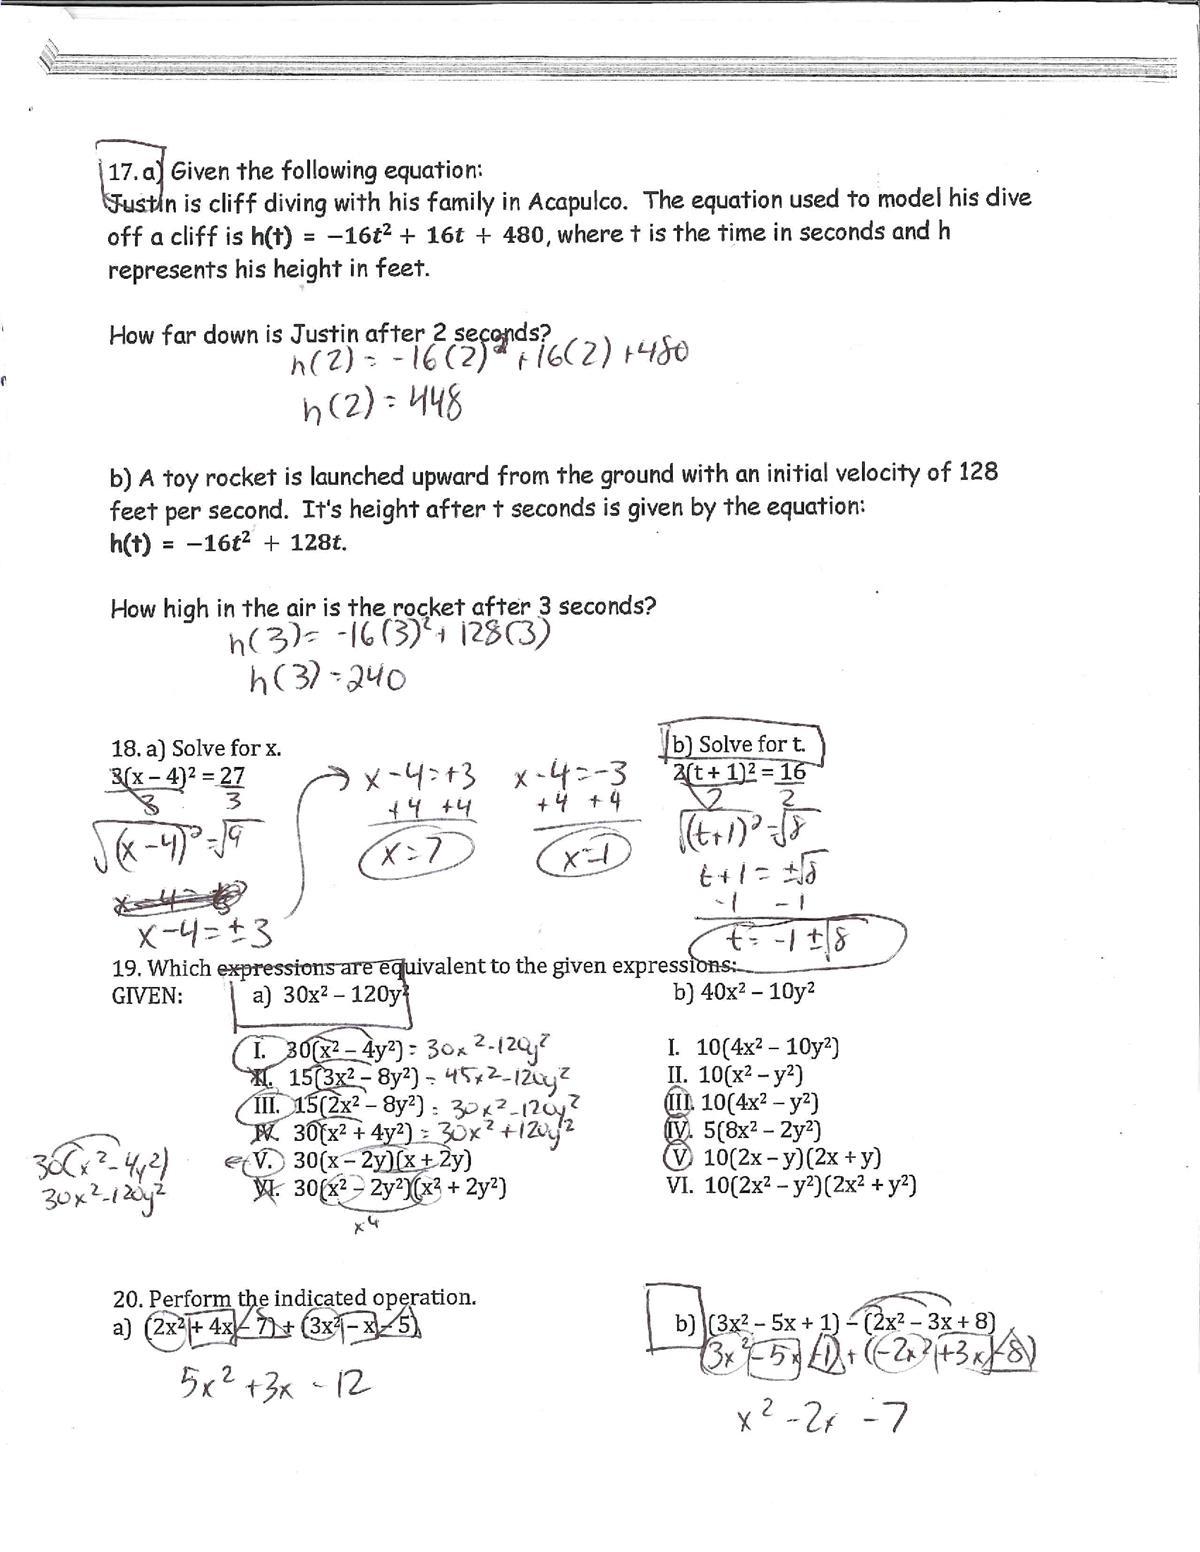 Zarro, Michael / Algebra 1 - Final Exam Review - Answer ...